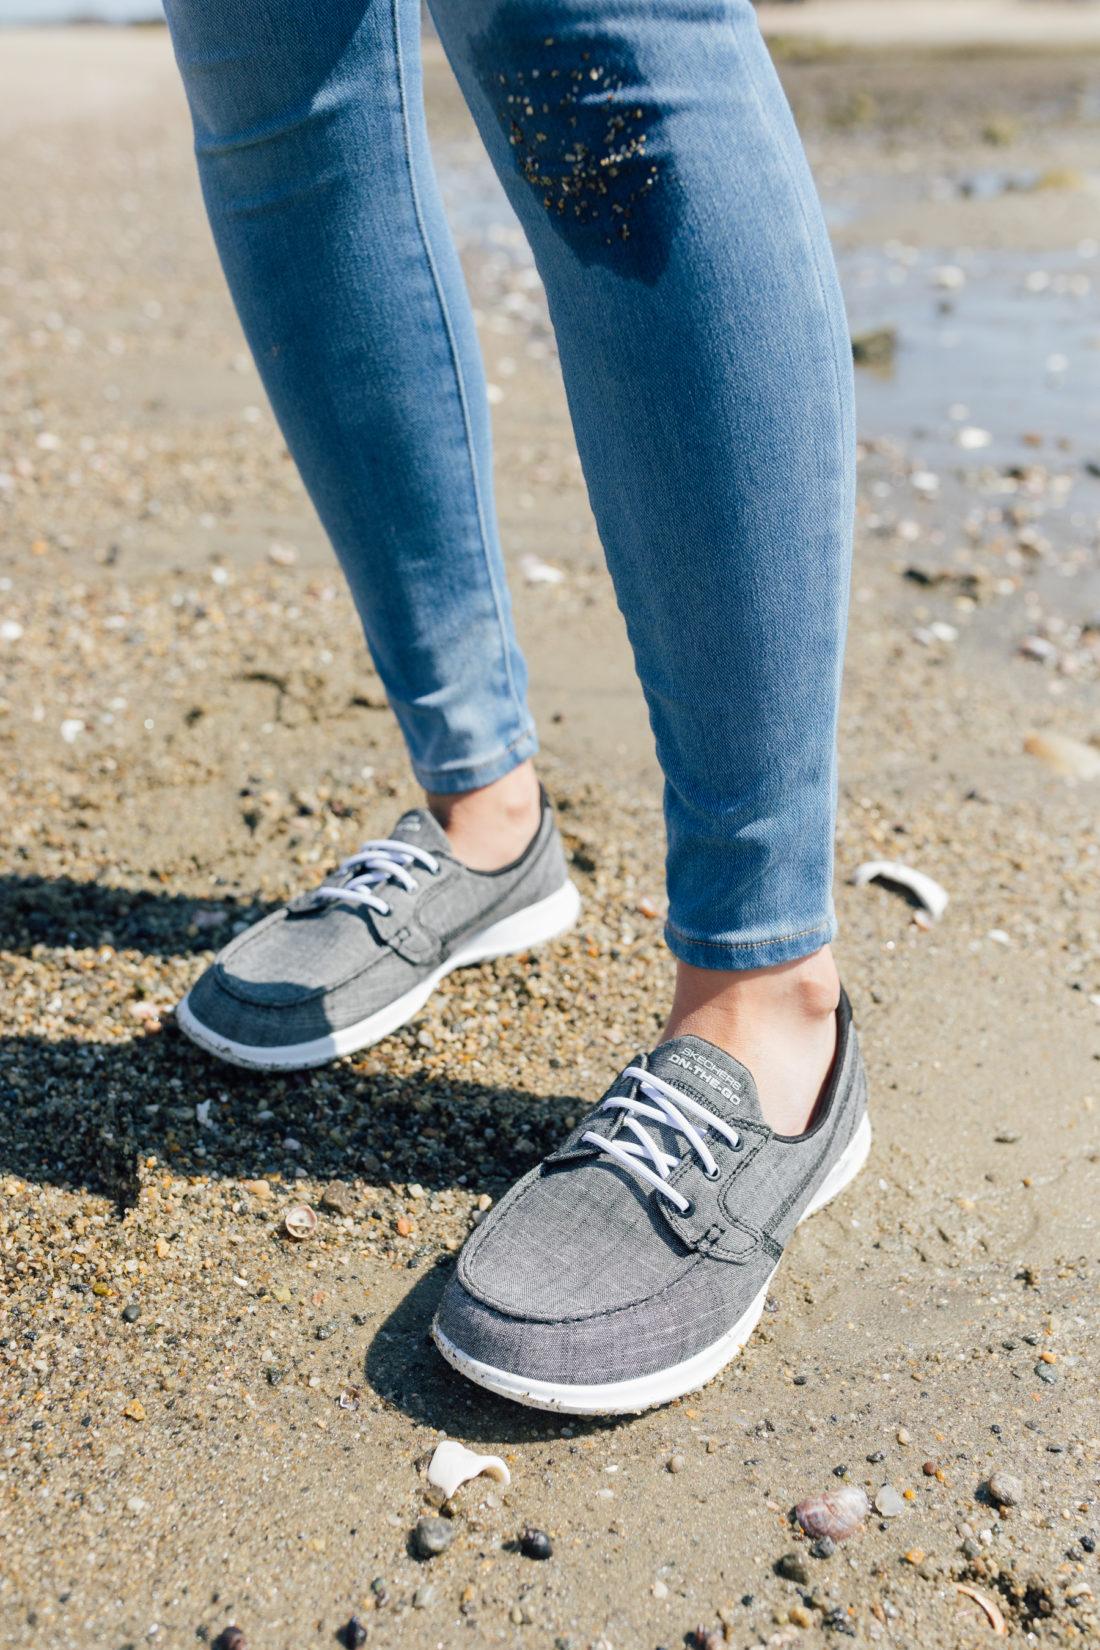 Eva Amurri Martino of Happily Eva After wears Skechers GoWalk Lite Isla Boat Shoe on the beach